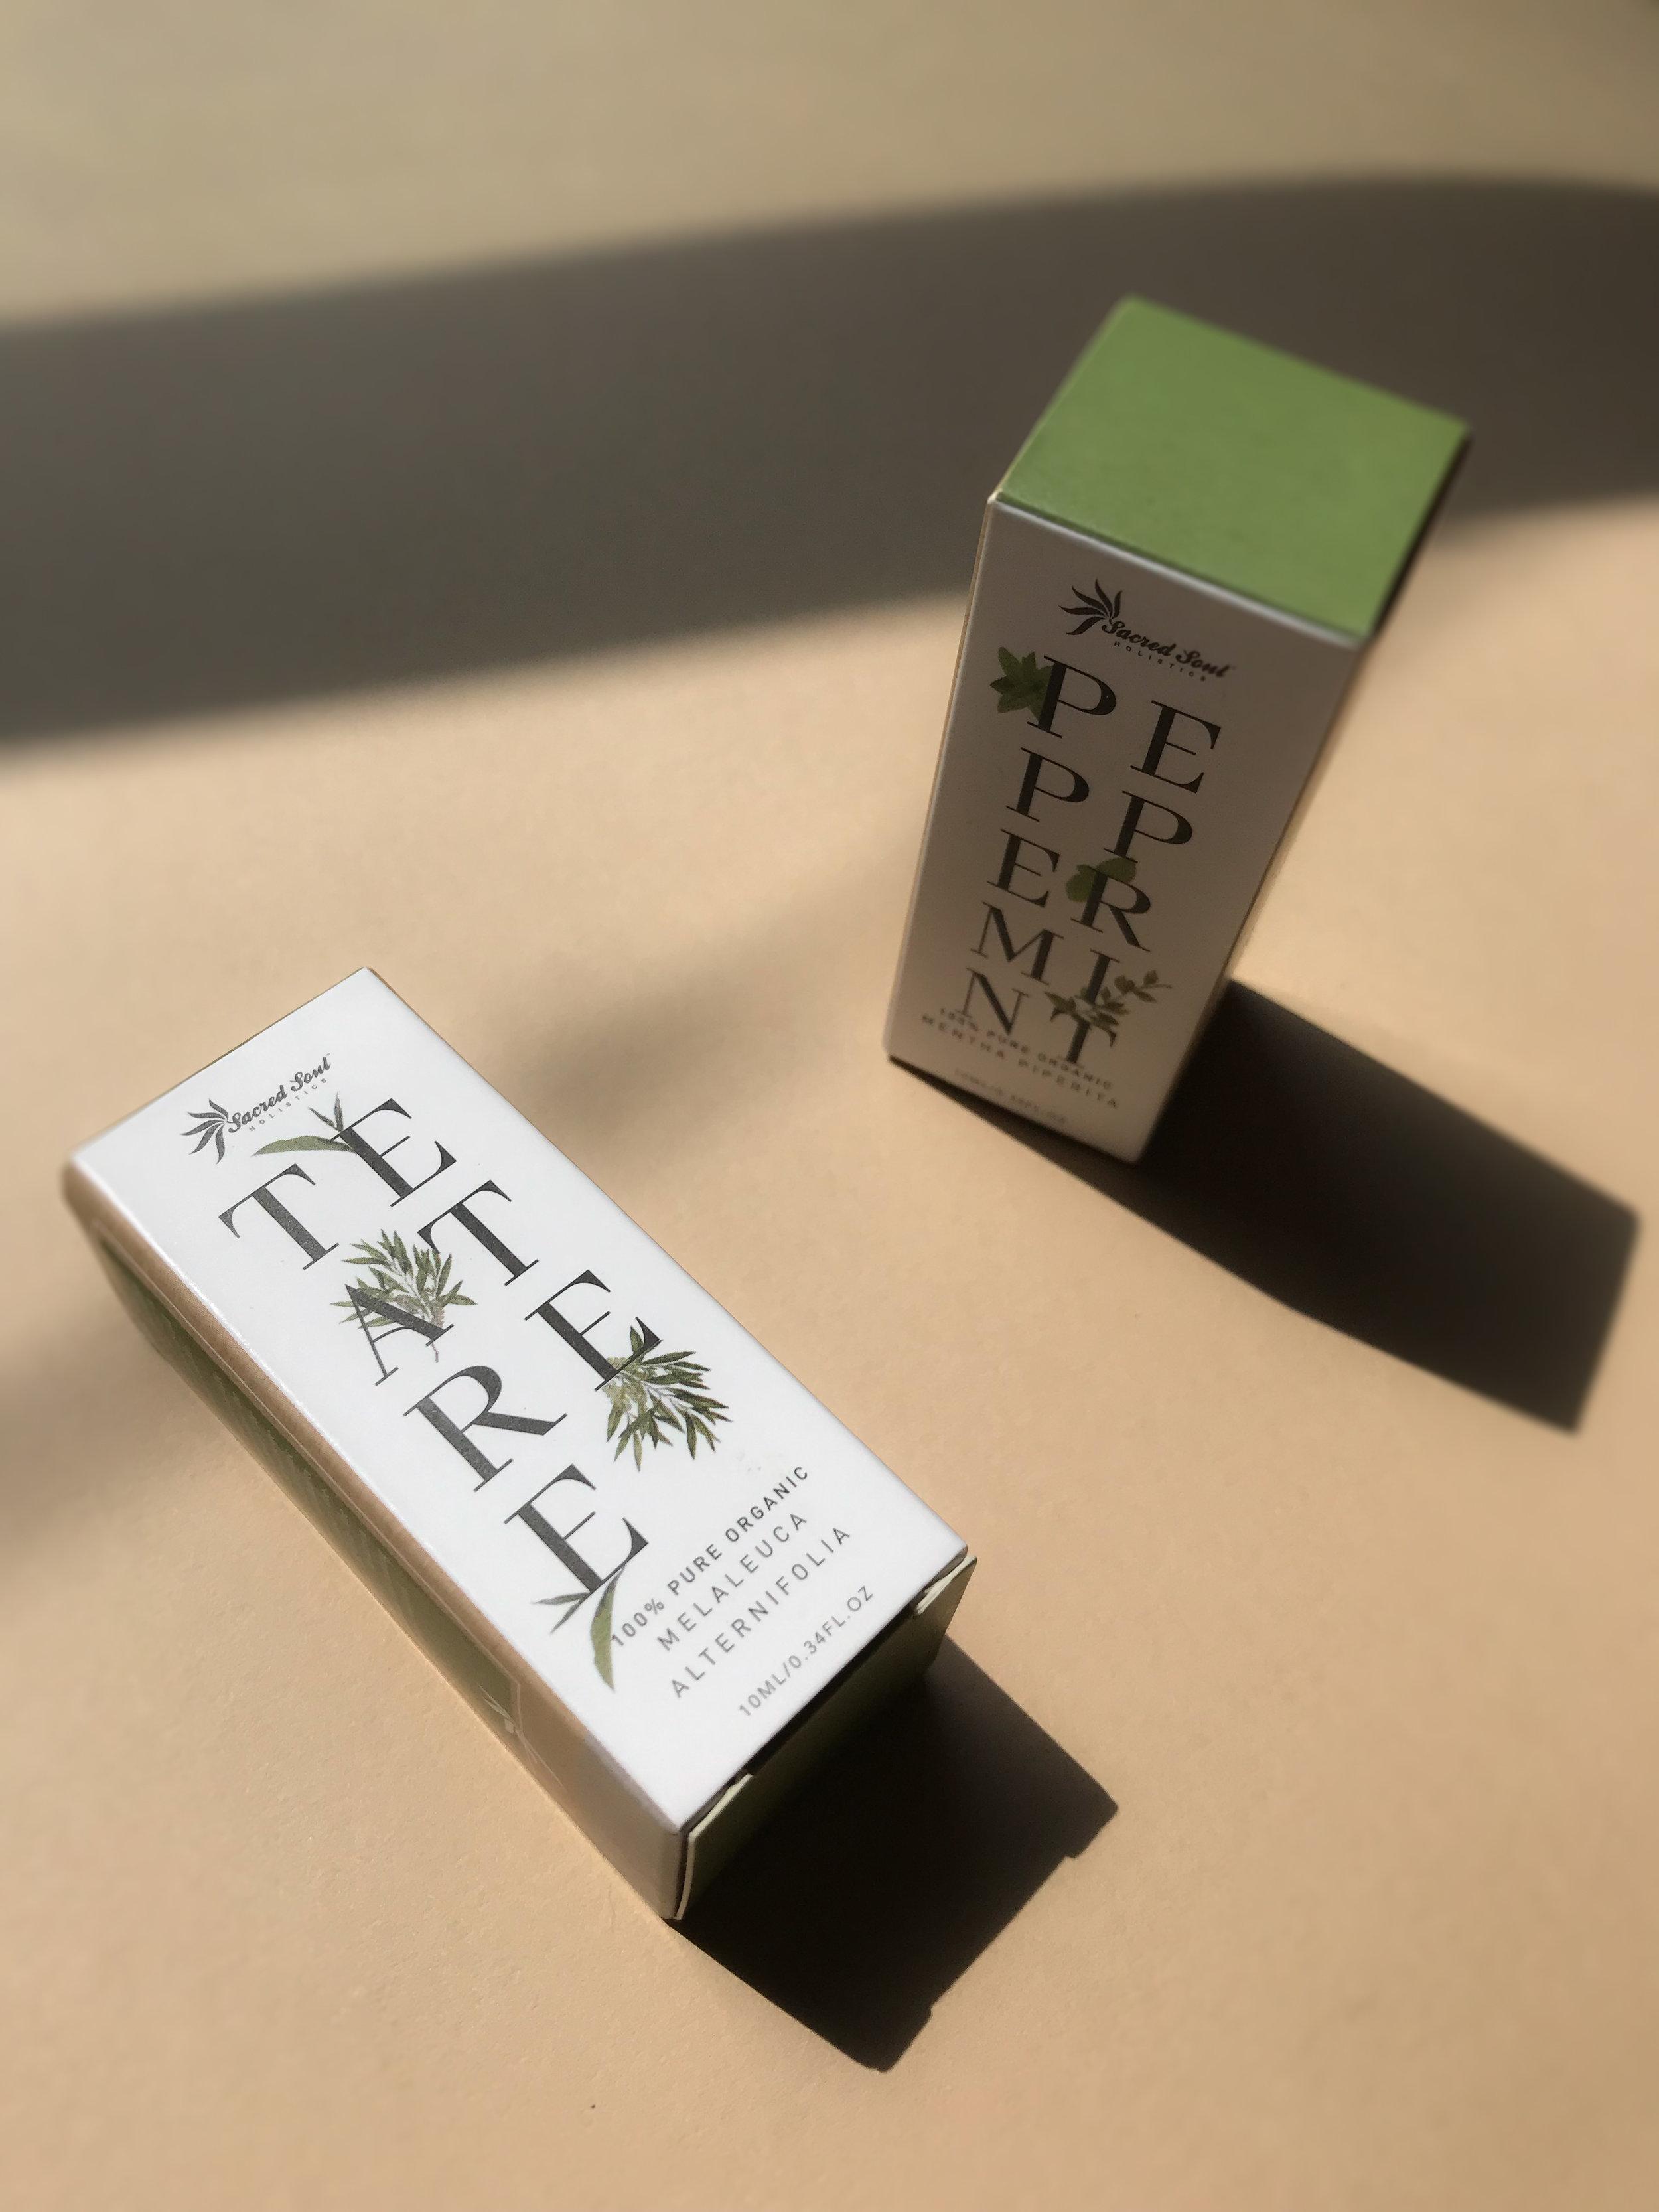 Ara the altar - Peppermint and Tea Tree Essential Oils